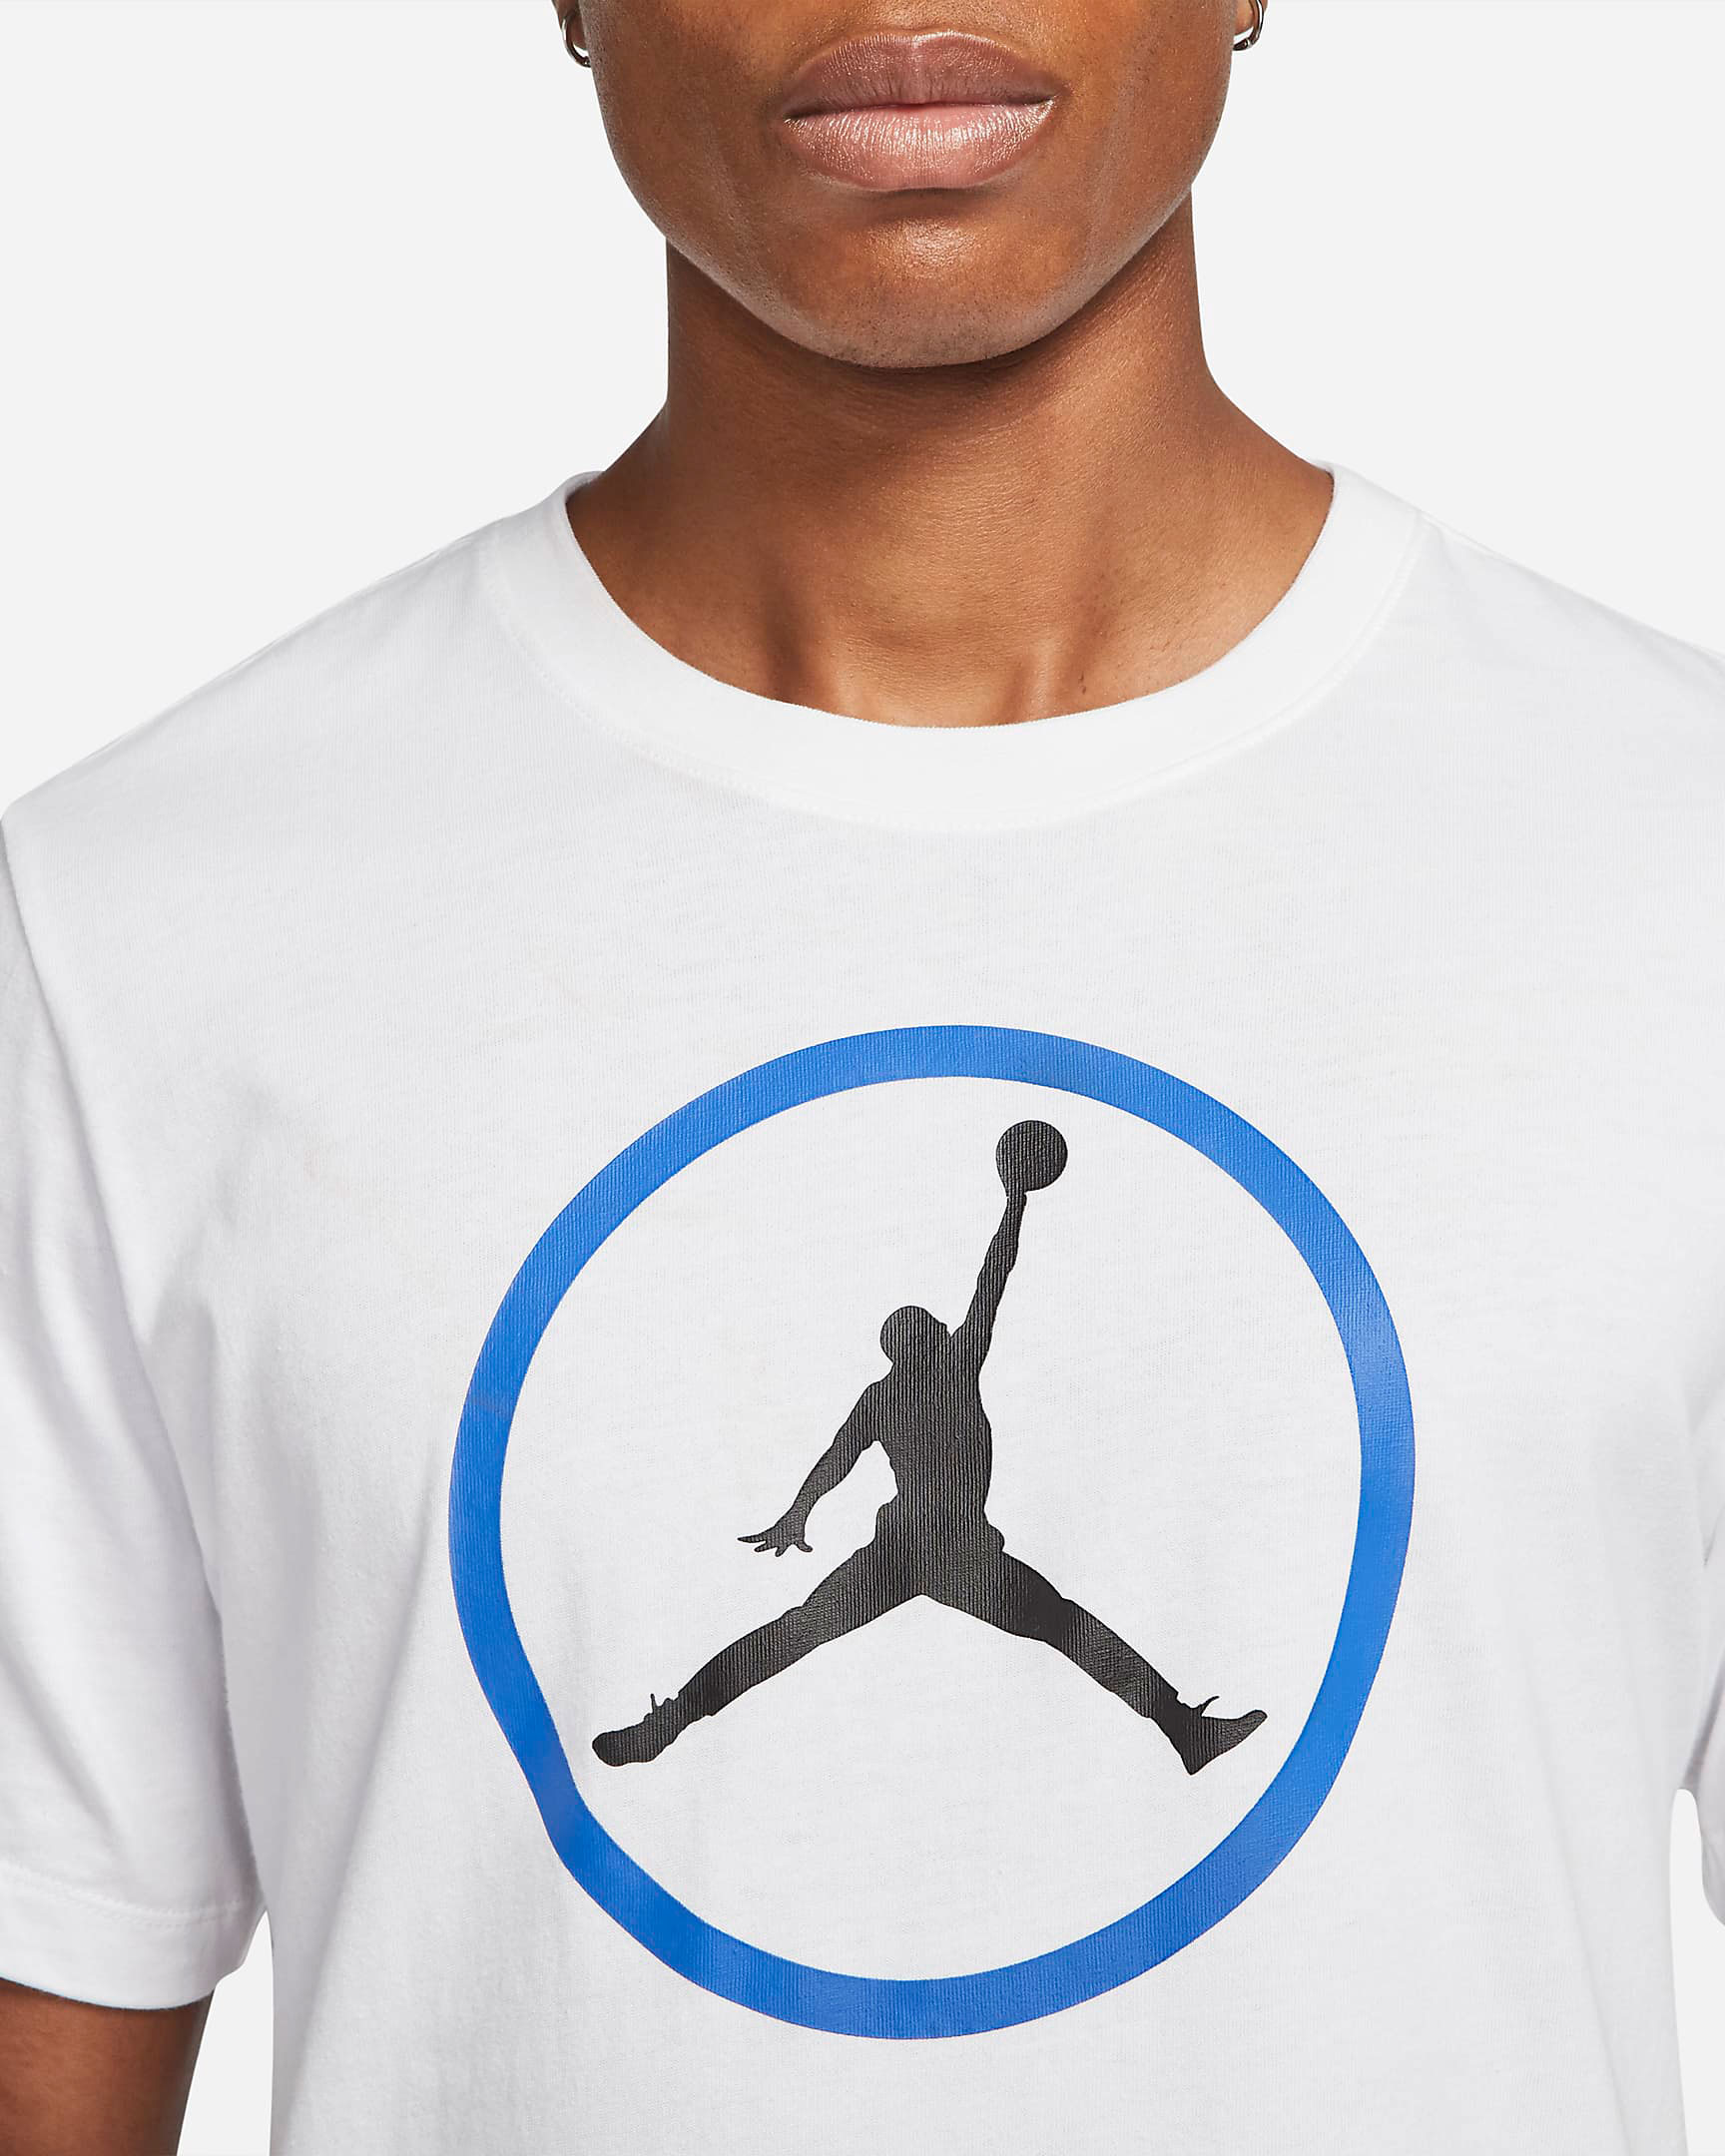 air-jordan-5-stealth-2021-shirt-3